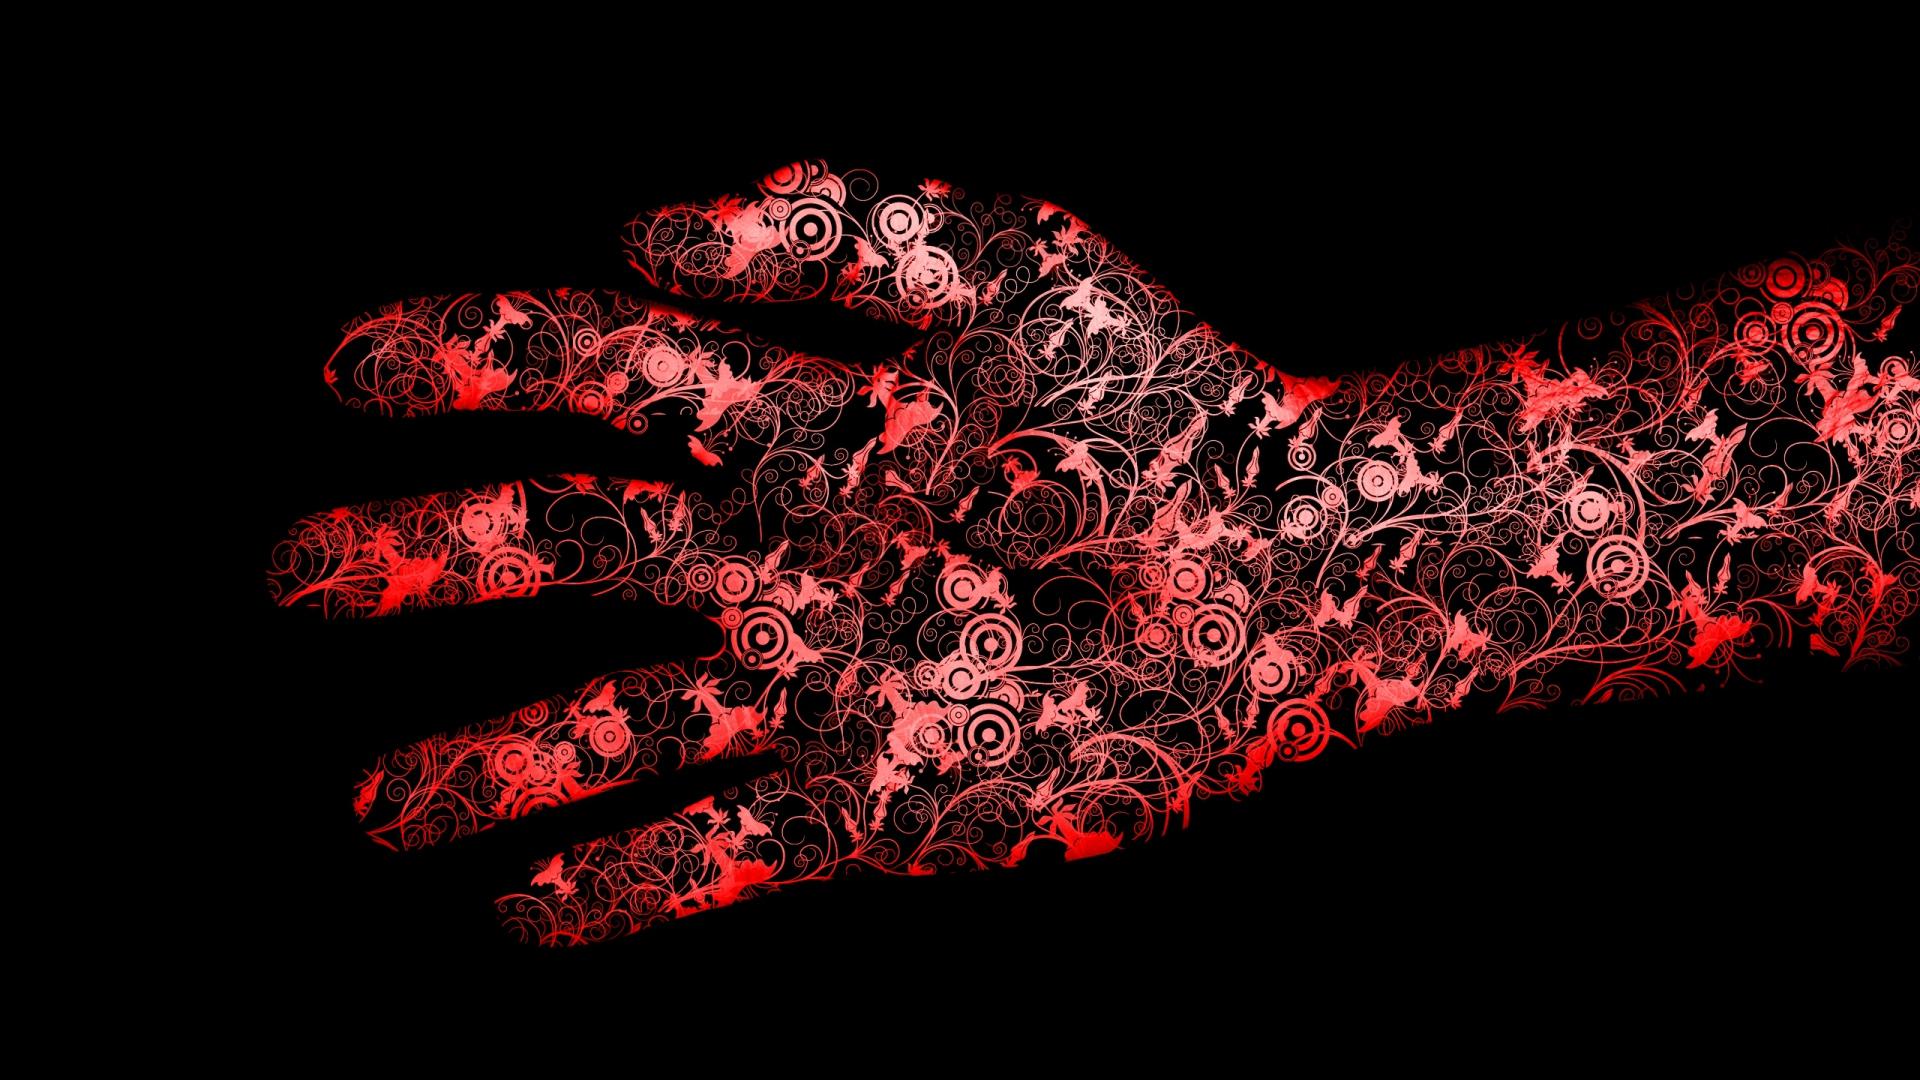 Download Wallpaper 1920x1080 Red Black Hand Flowers Full Hd 1080p